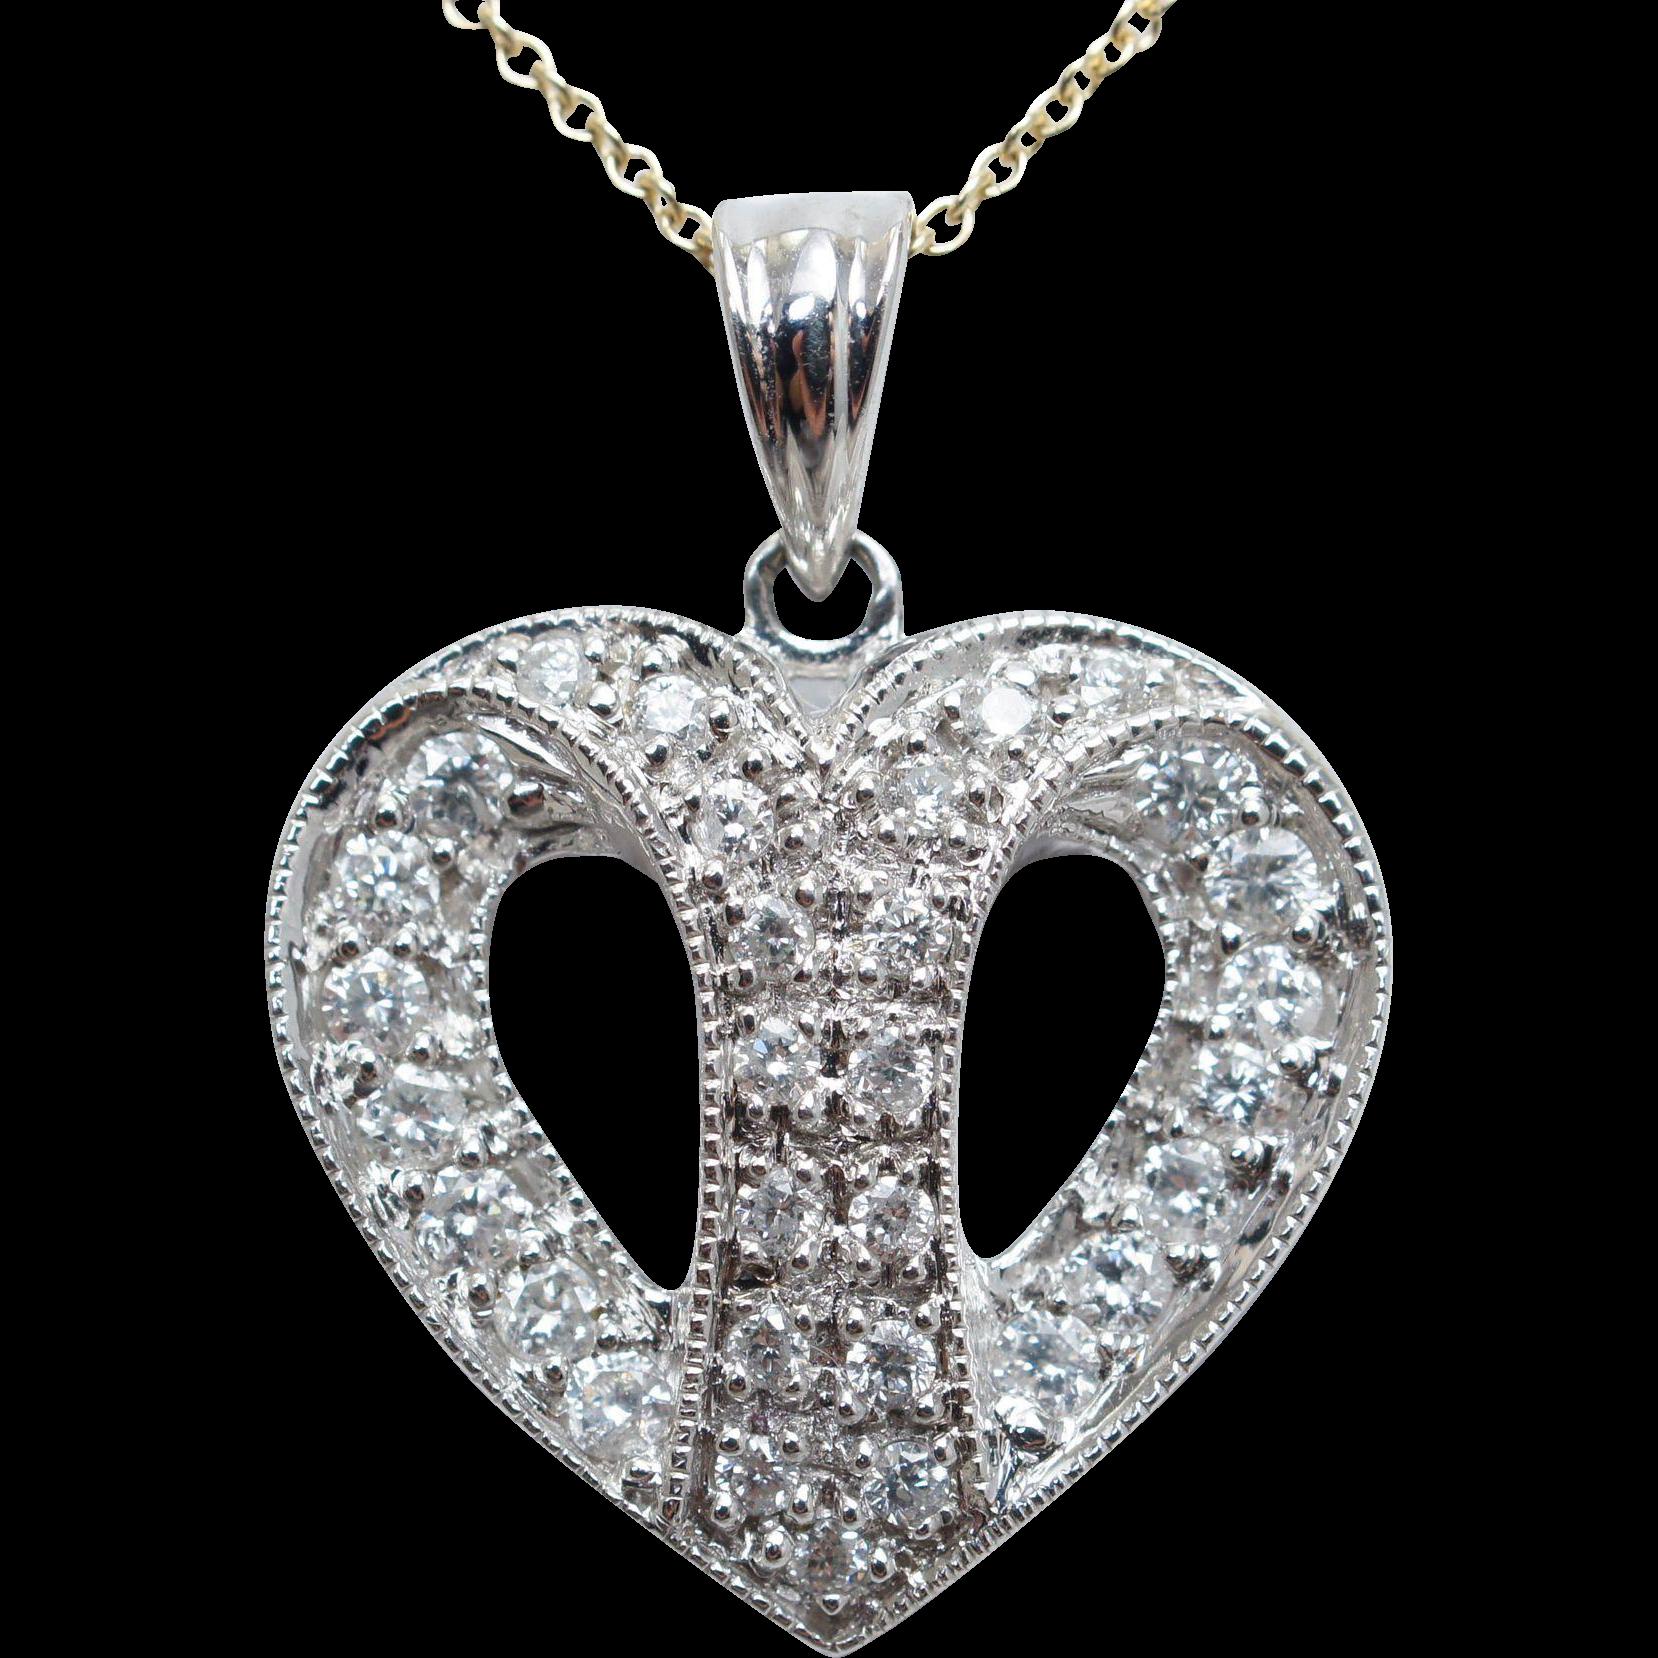 Diamond Split Heart Pendant Necklace 14k White Gold Dainty Heart